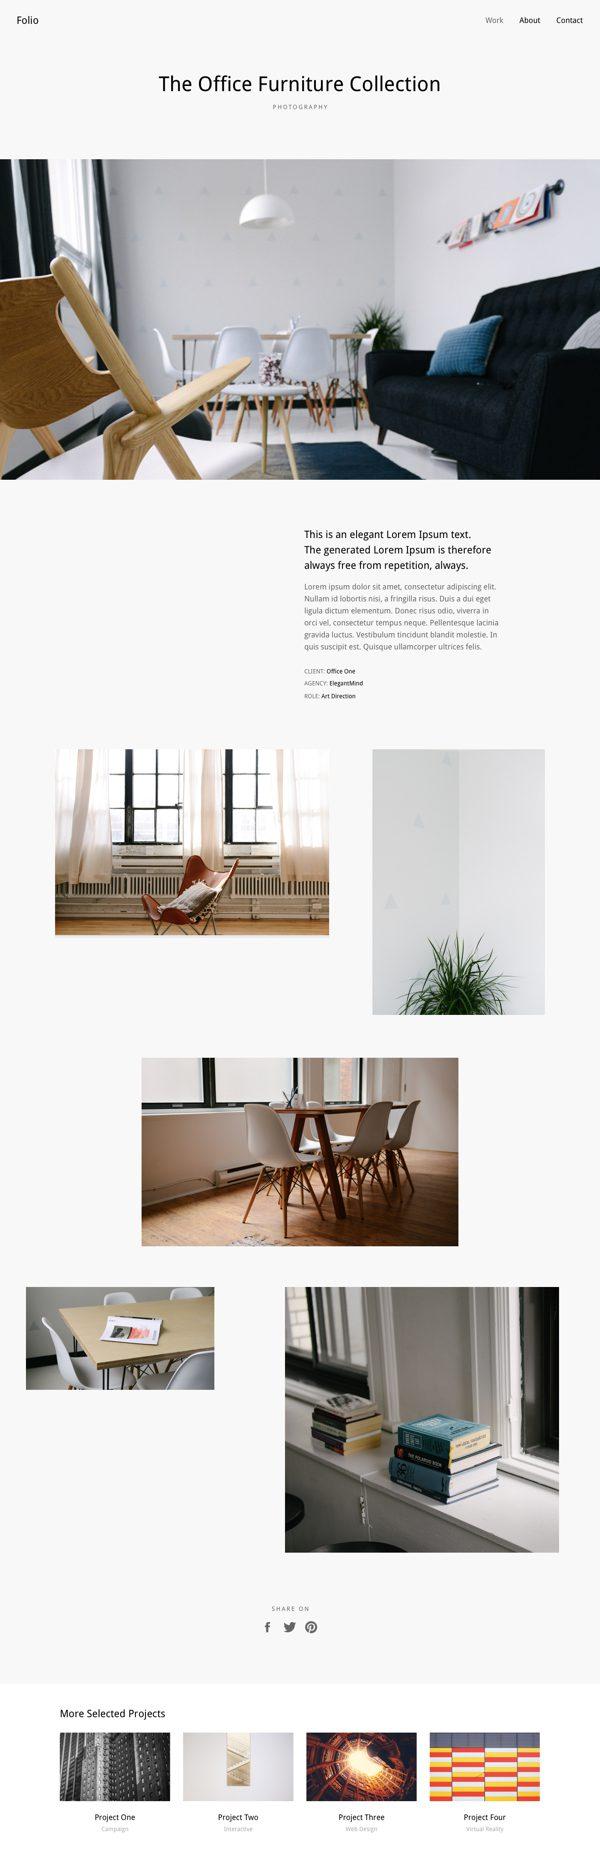 single-page-portfolio-layout-02